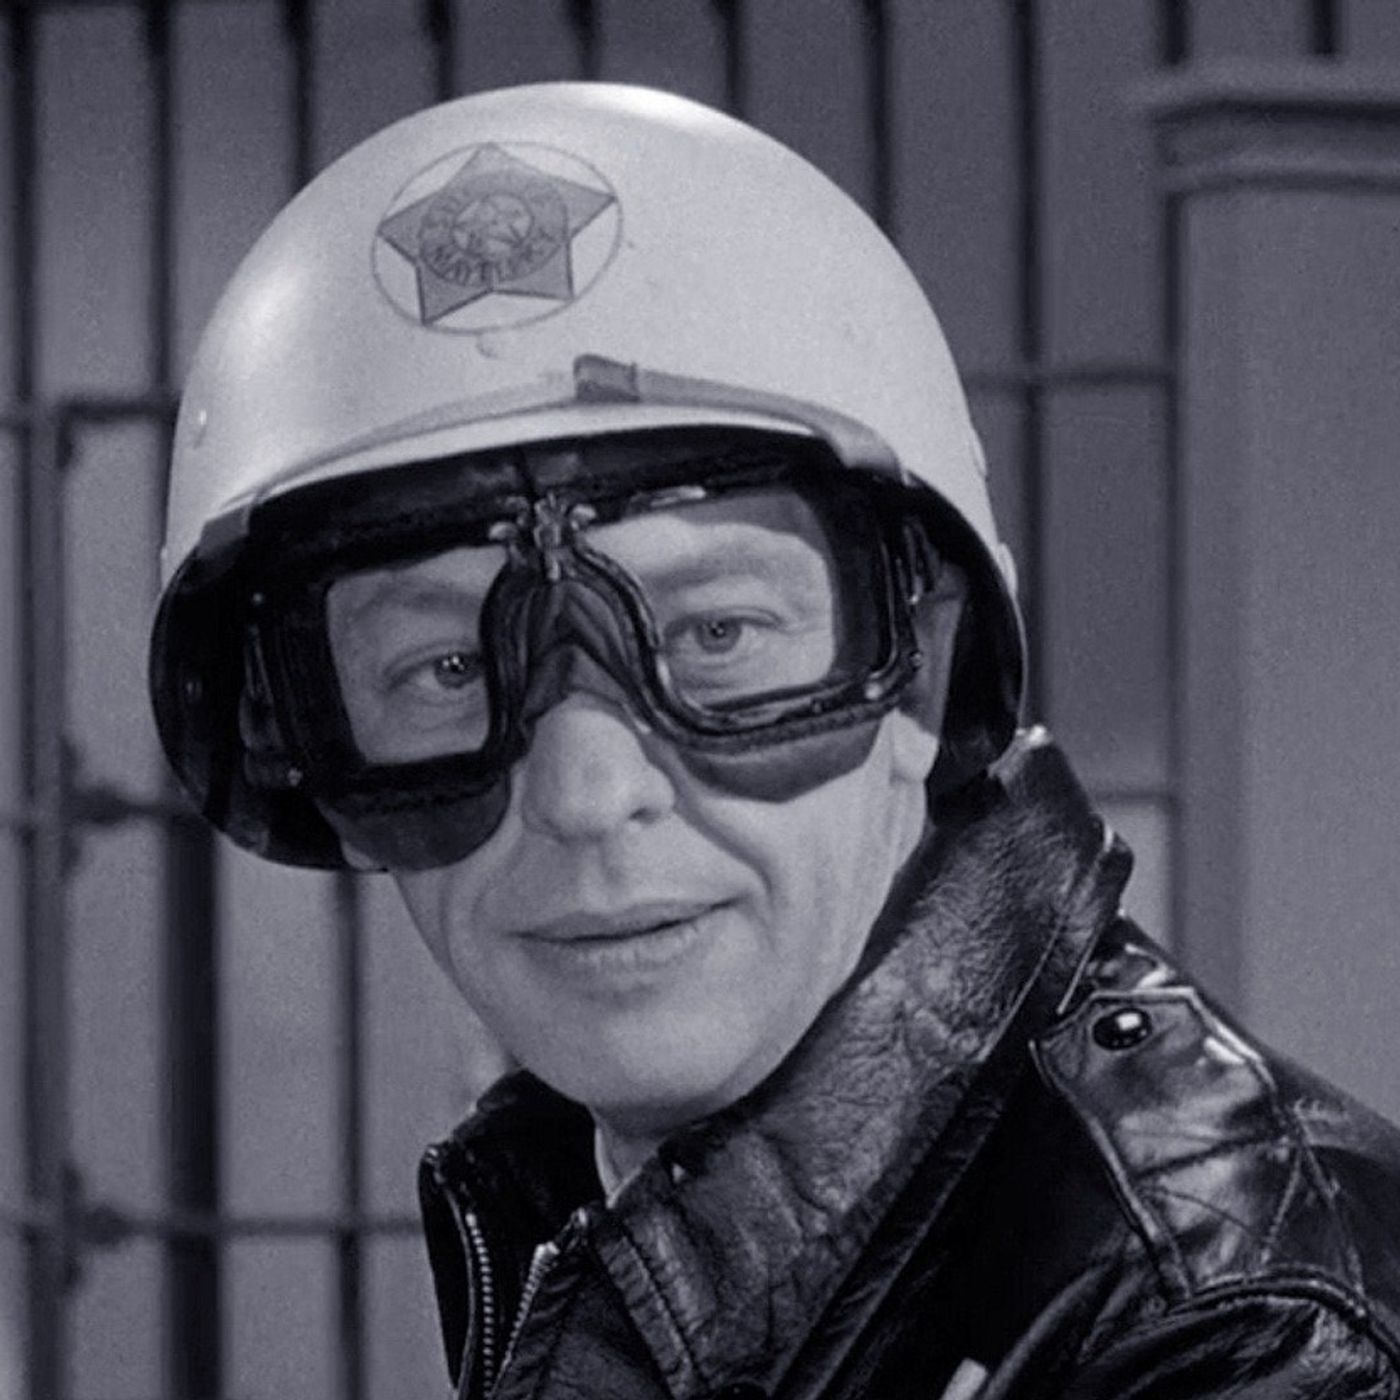 89: ACABF (All Cops Are Barney Fife)